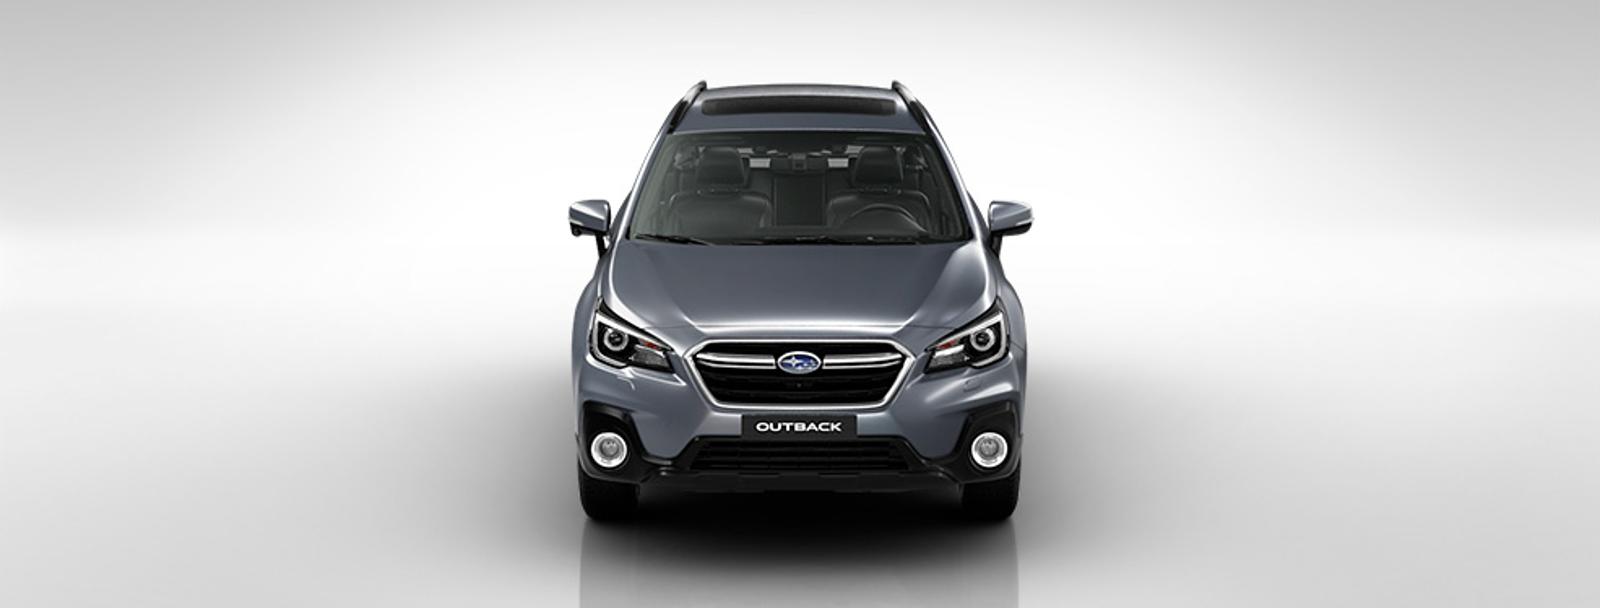 Frontal Subaru Outback